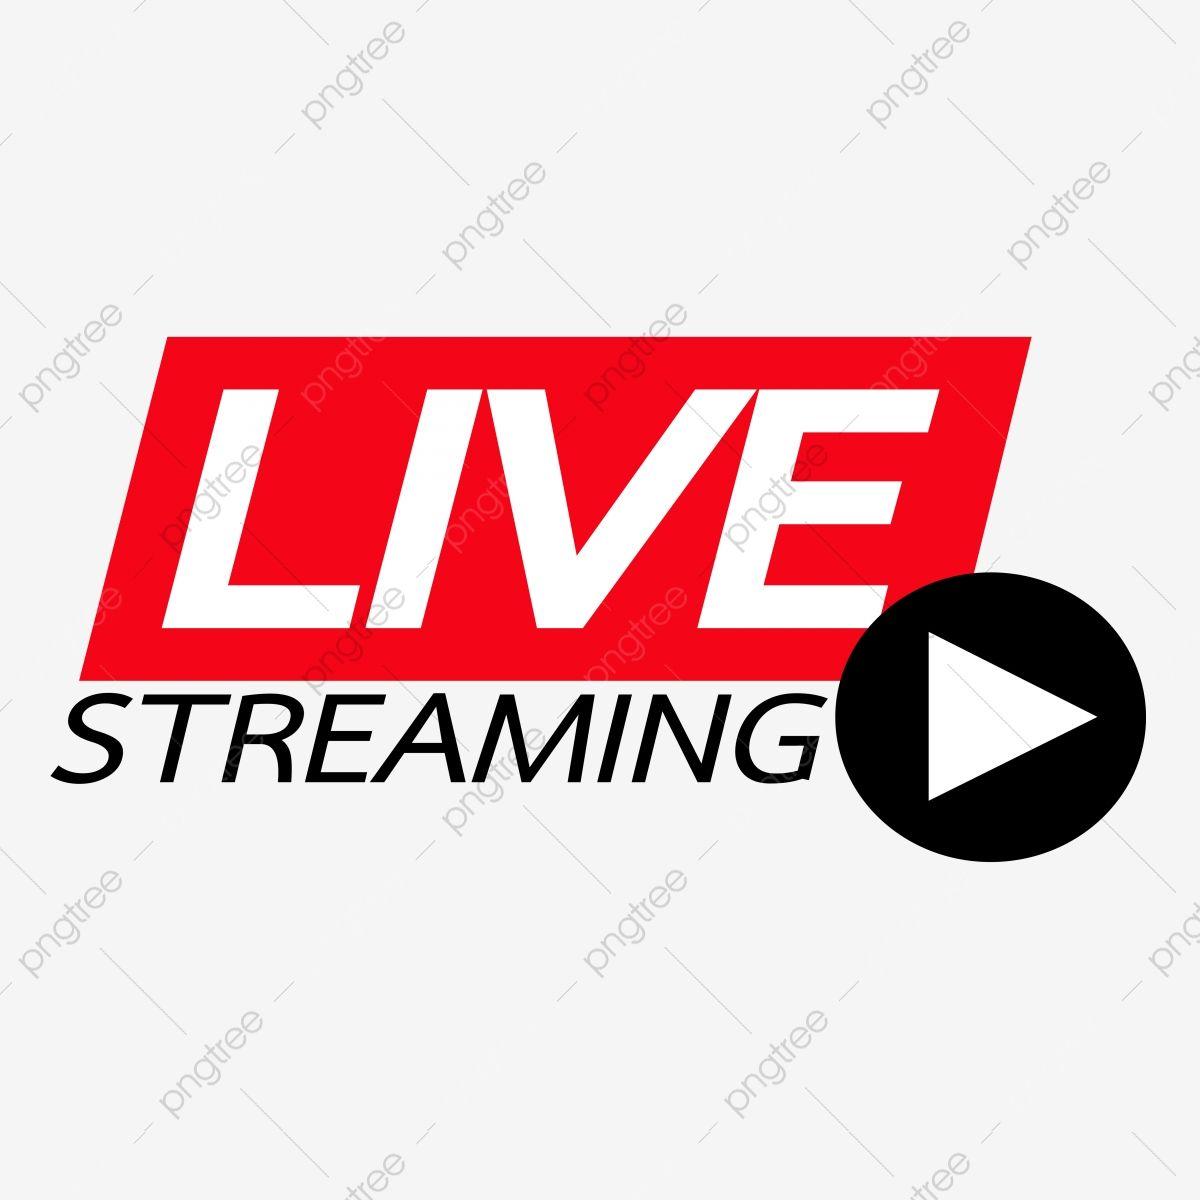 Transmision En Vivo Logo En Linea Logo Icons Iconos En Linea Iconos En Vivo Png Y Vector Para Descargar Gratis Pngtree Online Logo Youtube Design Online Icon